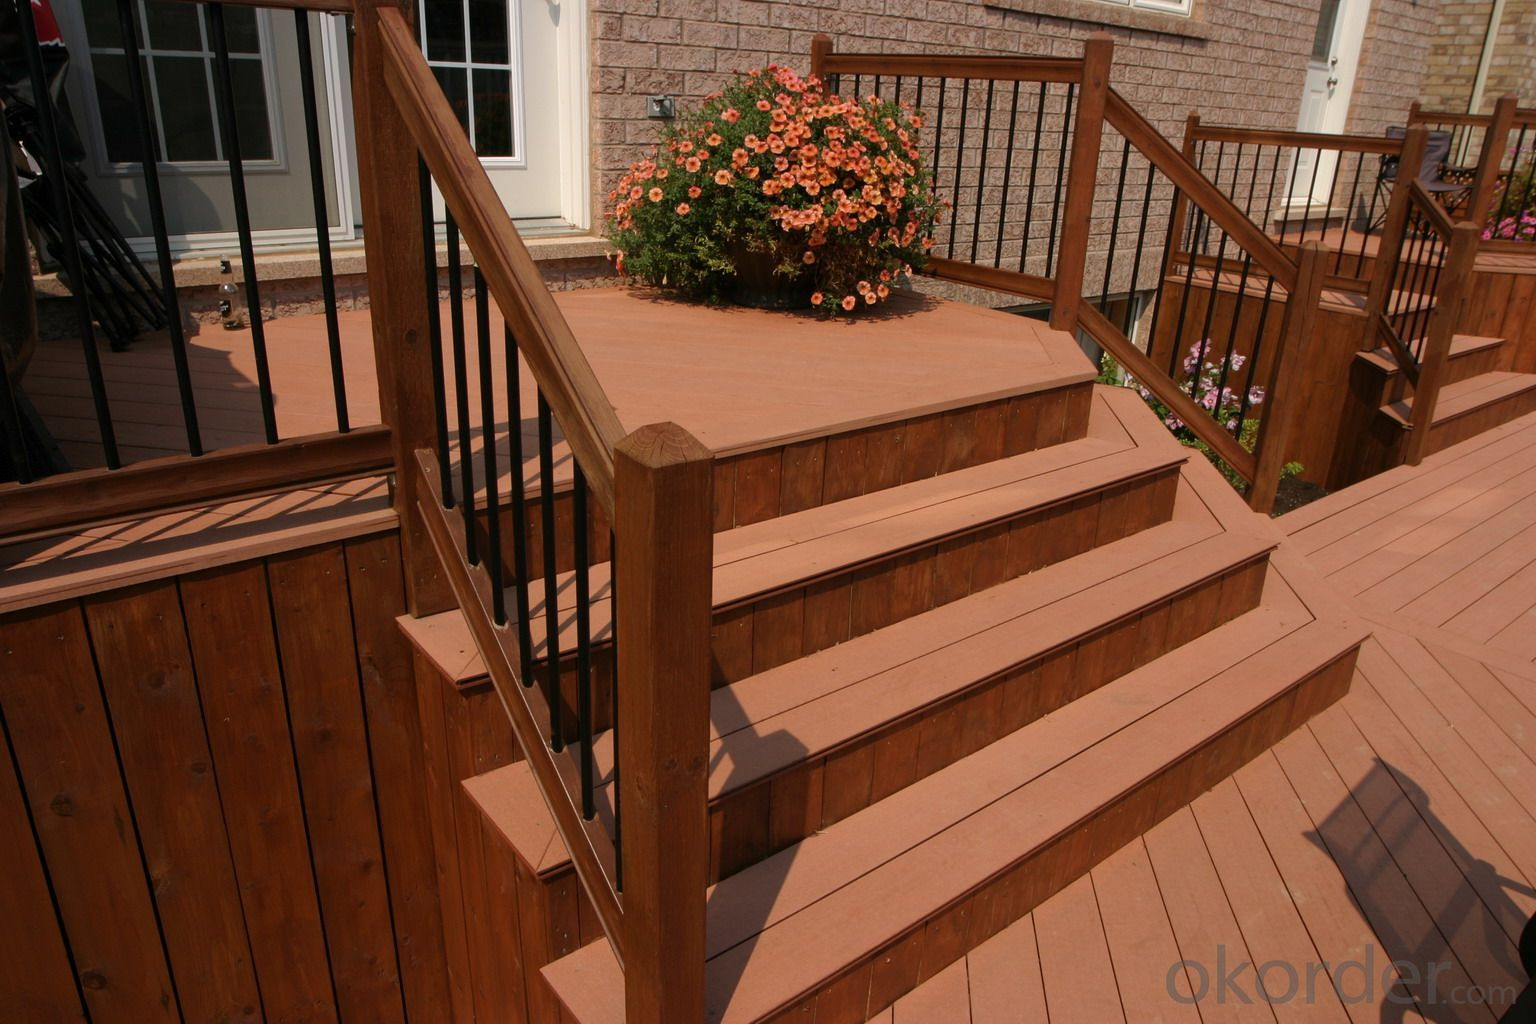 Buy composit outdoor decking plastic decking for Garden decking tiles homebase